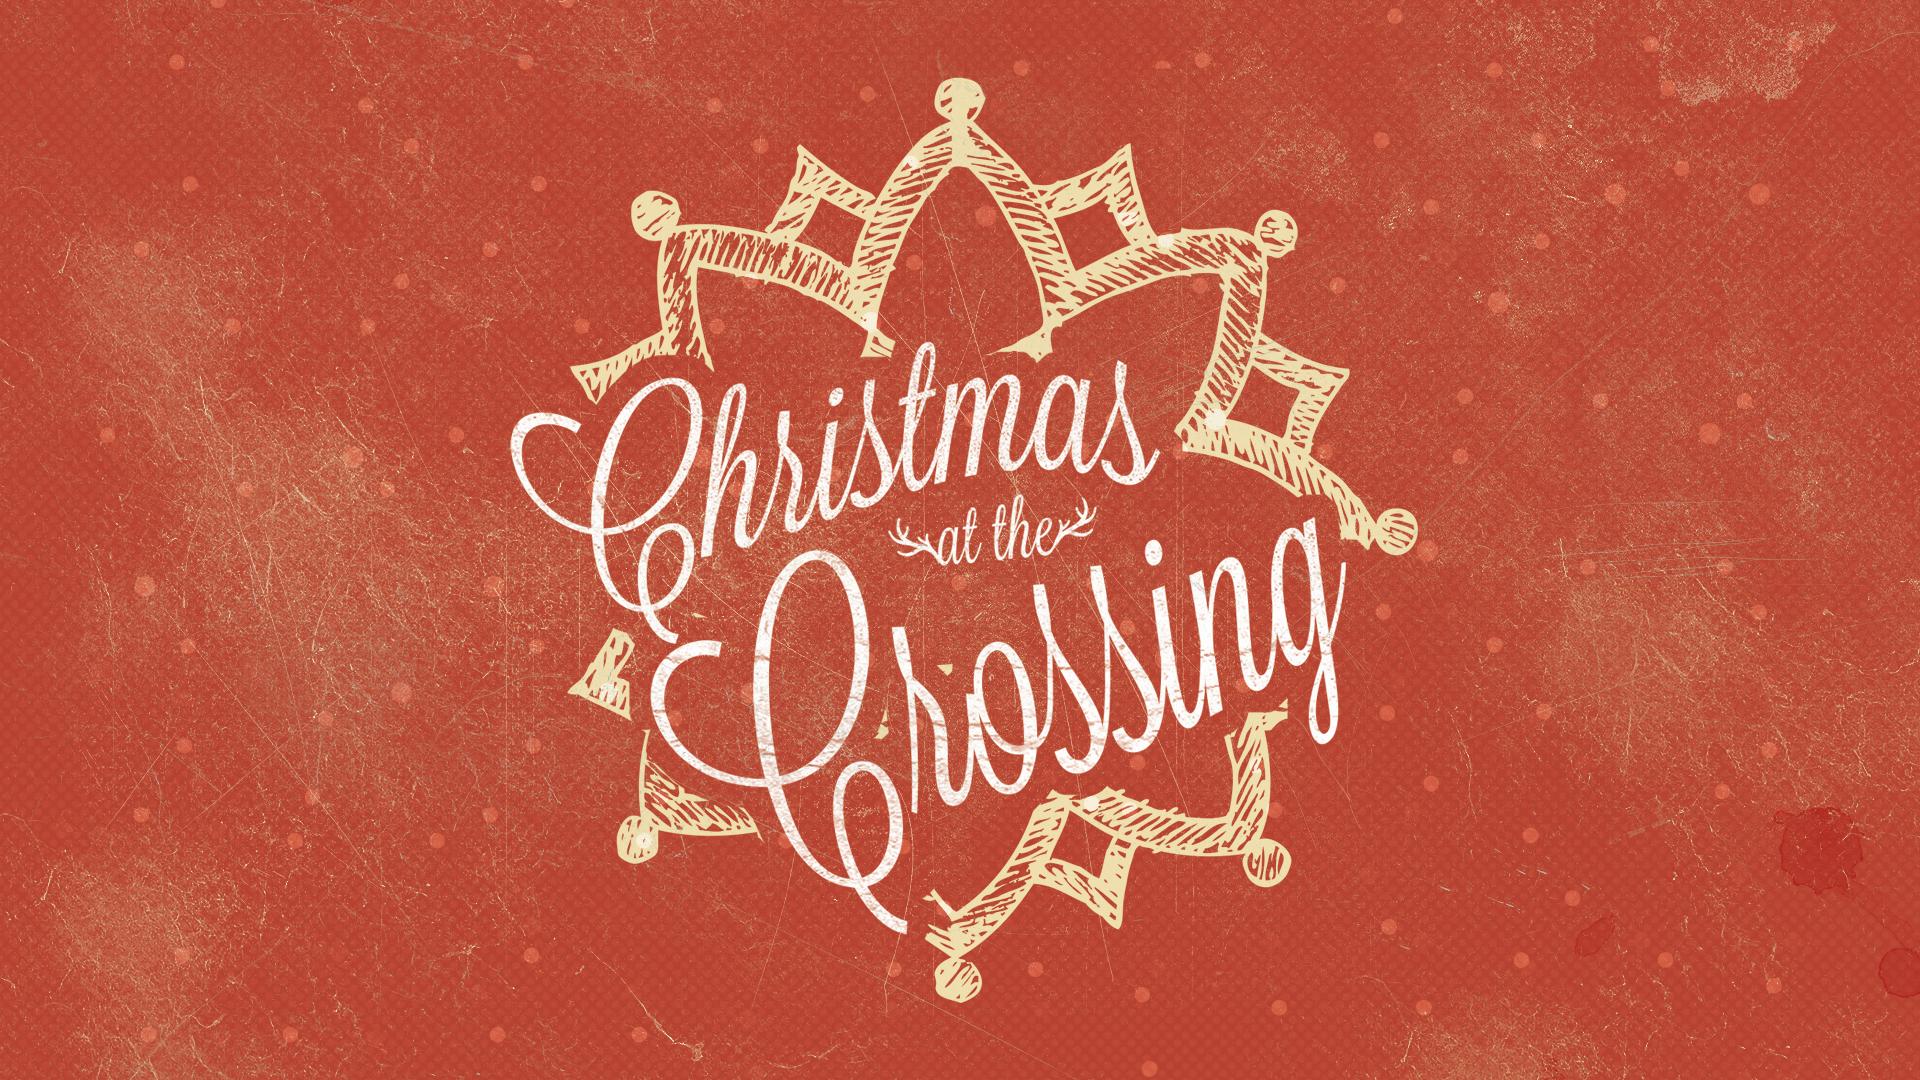 ChristmasAtCrossingFinal169.jpg